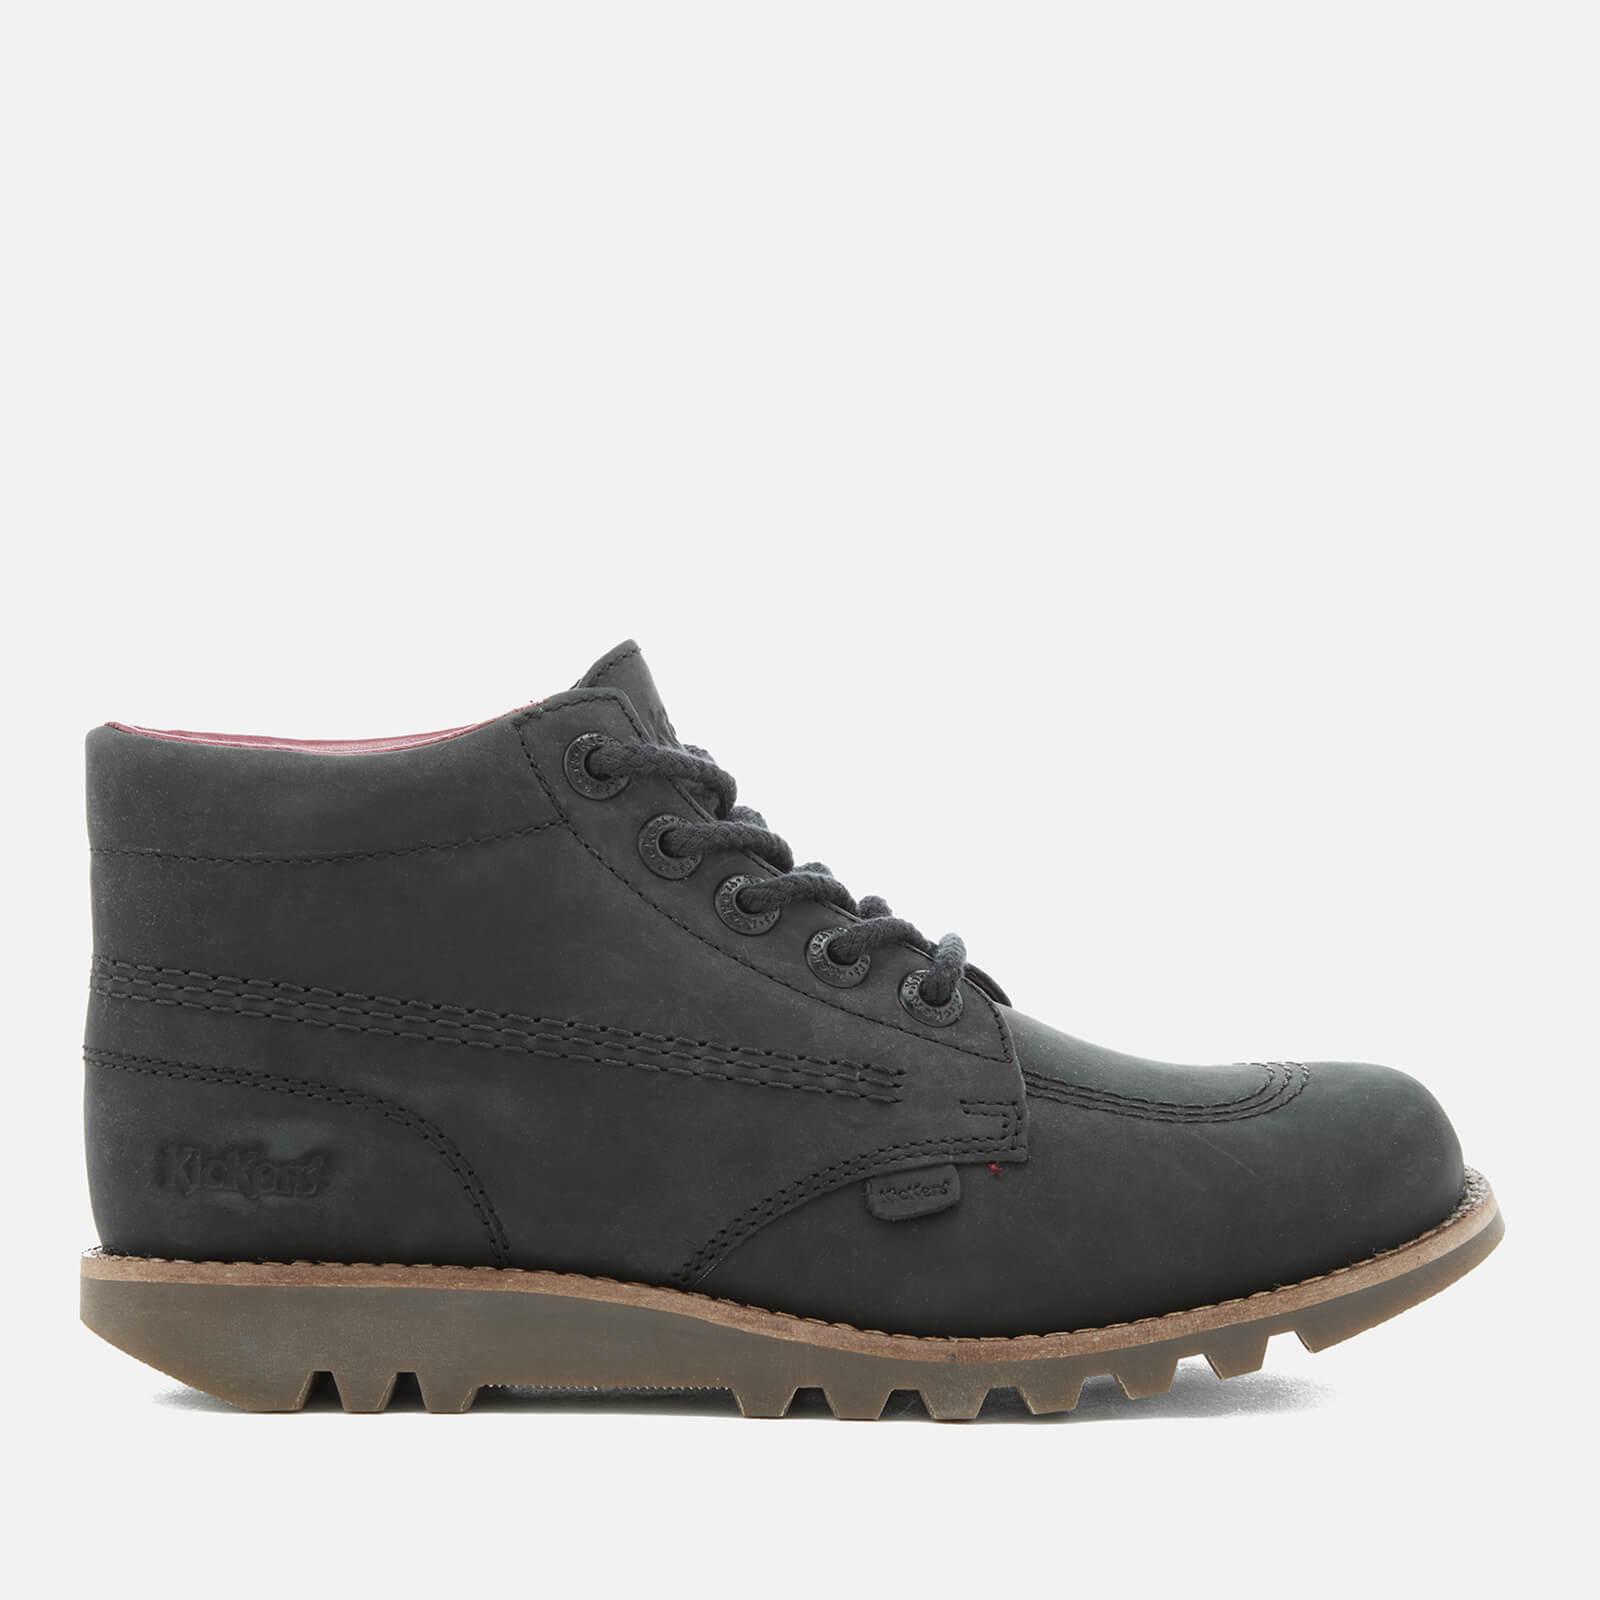 bff6423cd8b2 Kickers Women's Kick Hi C Leather Boots - Black Clothing   Zavvi